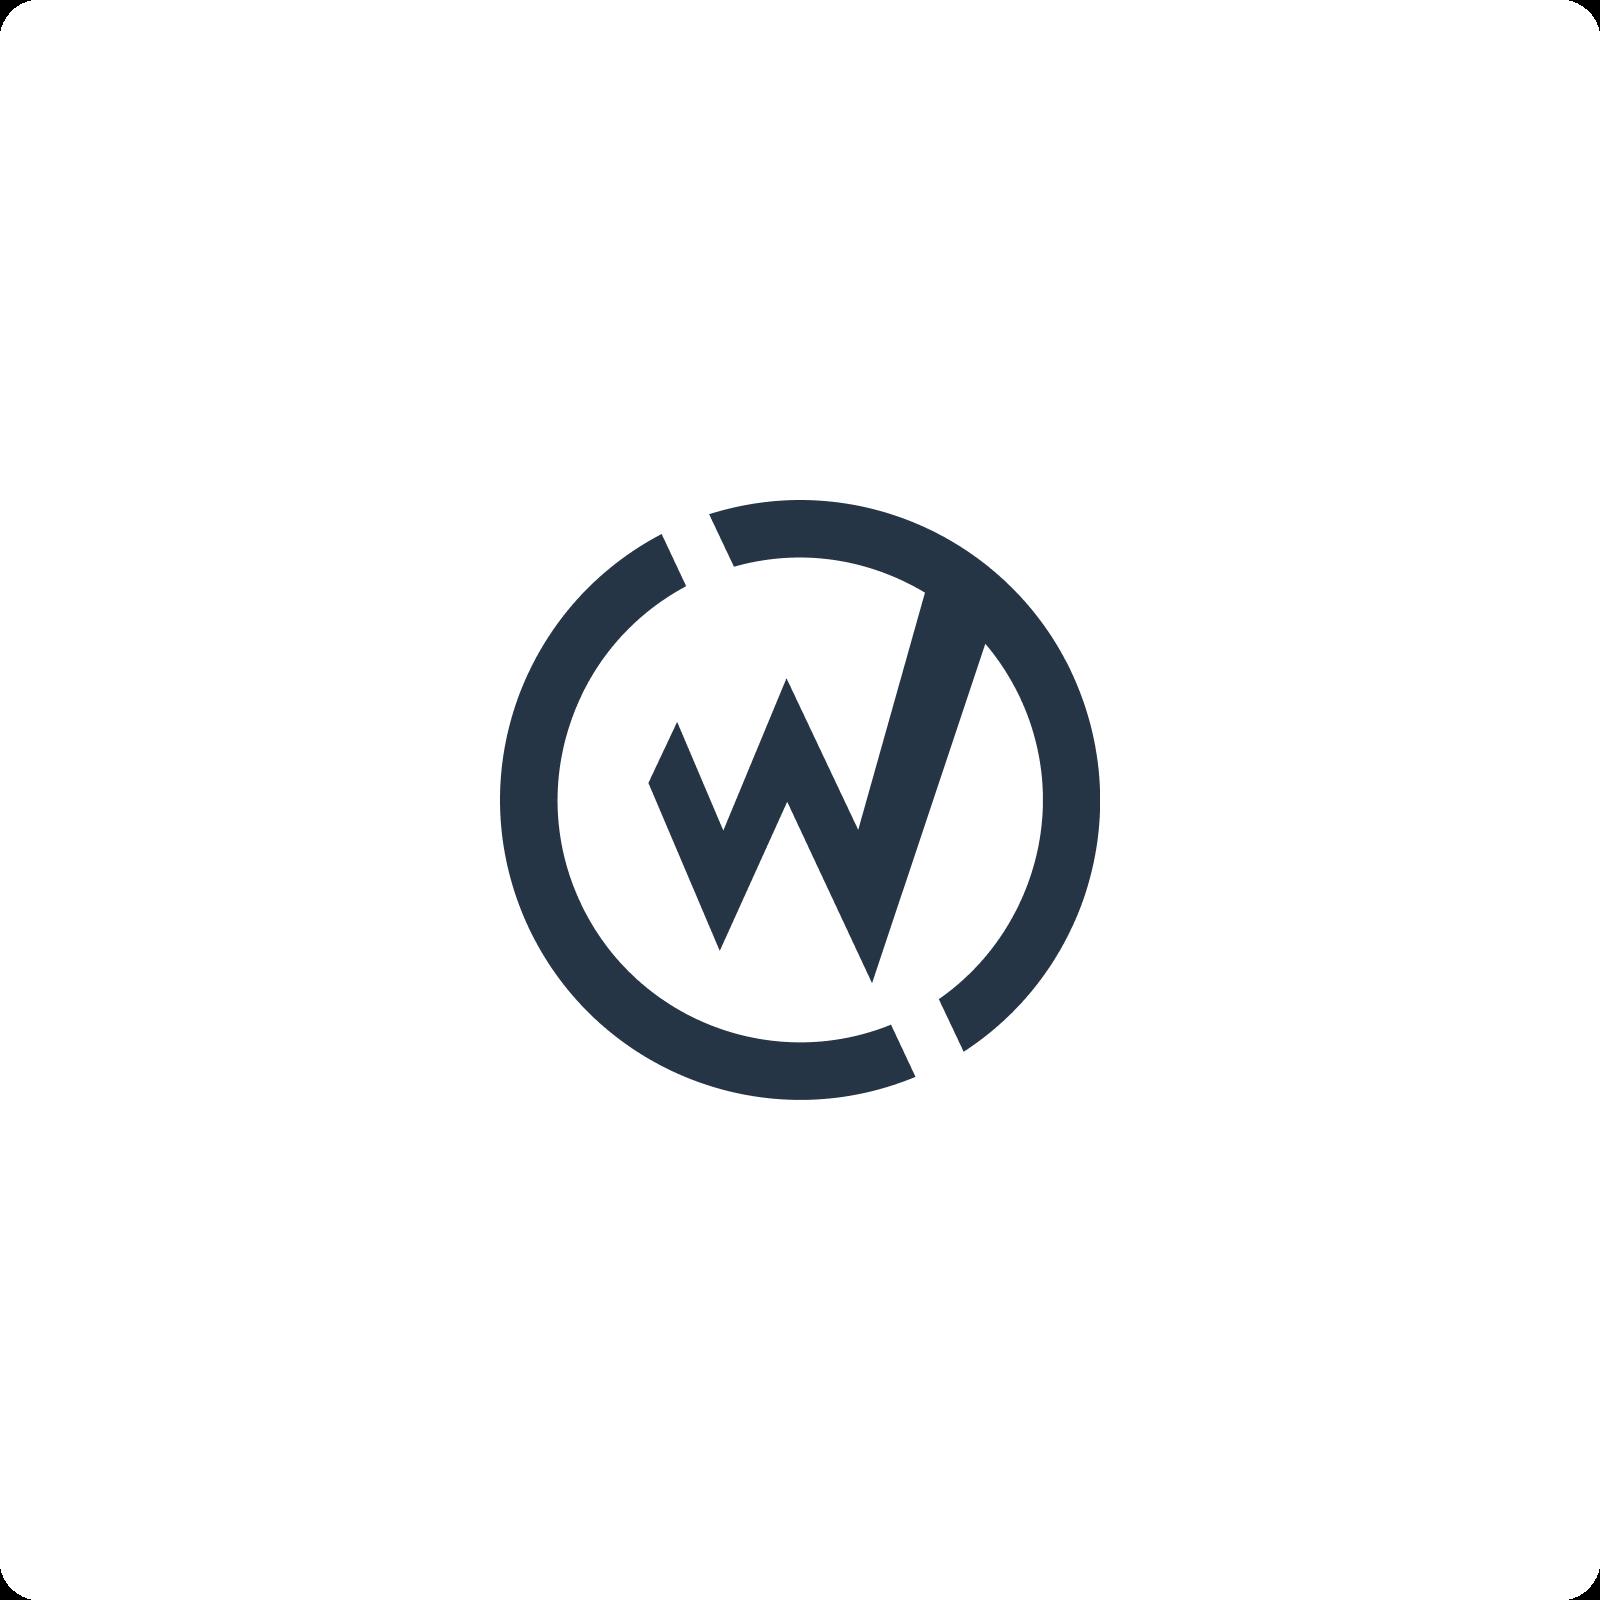 WillowTree LLC